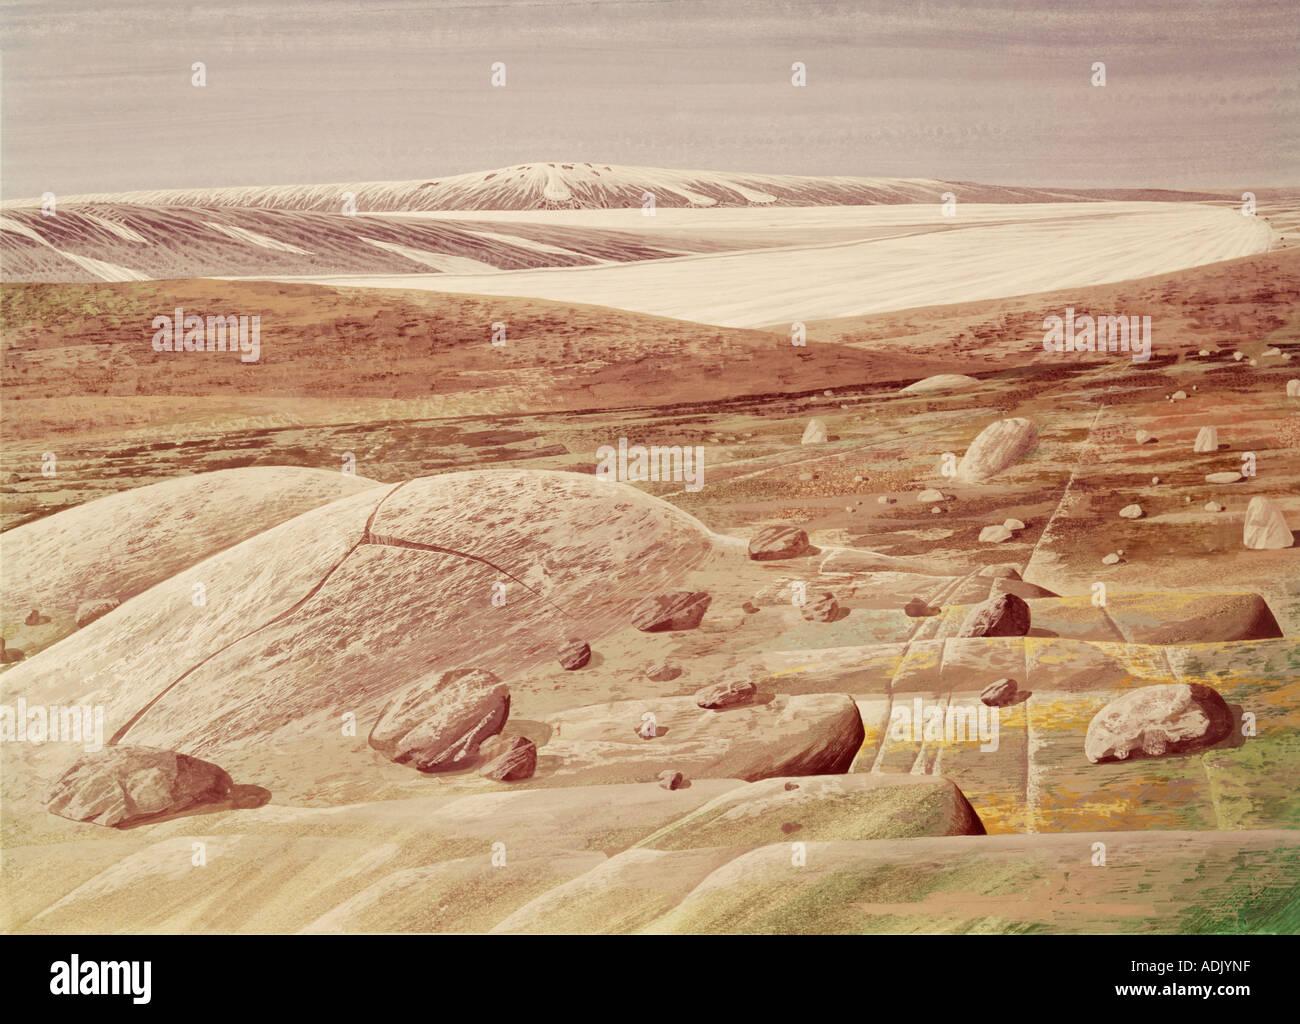 Pleistocene landscape - Stock Image